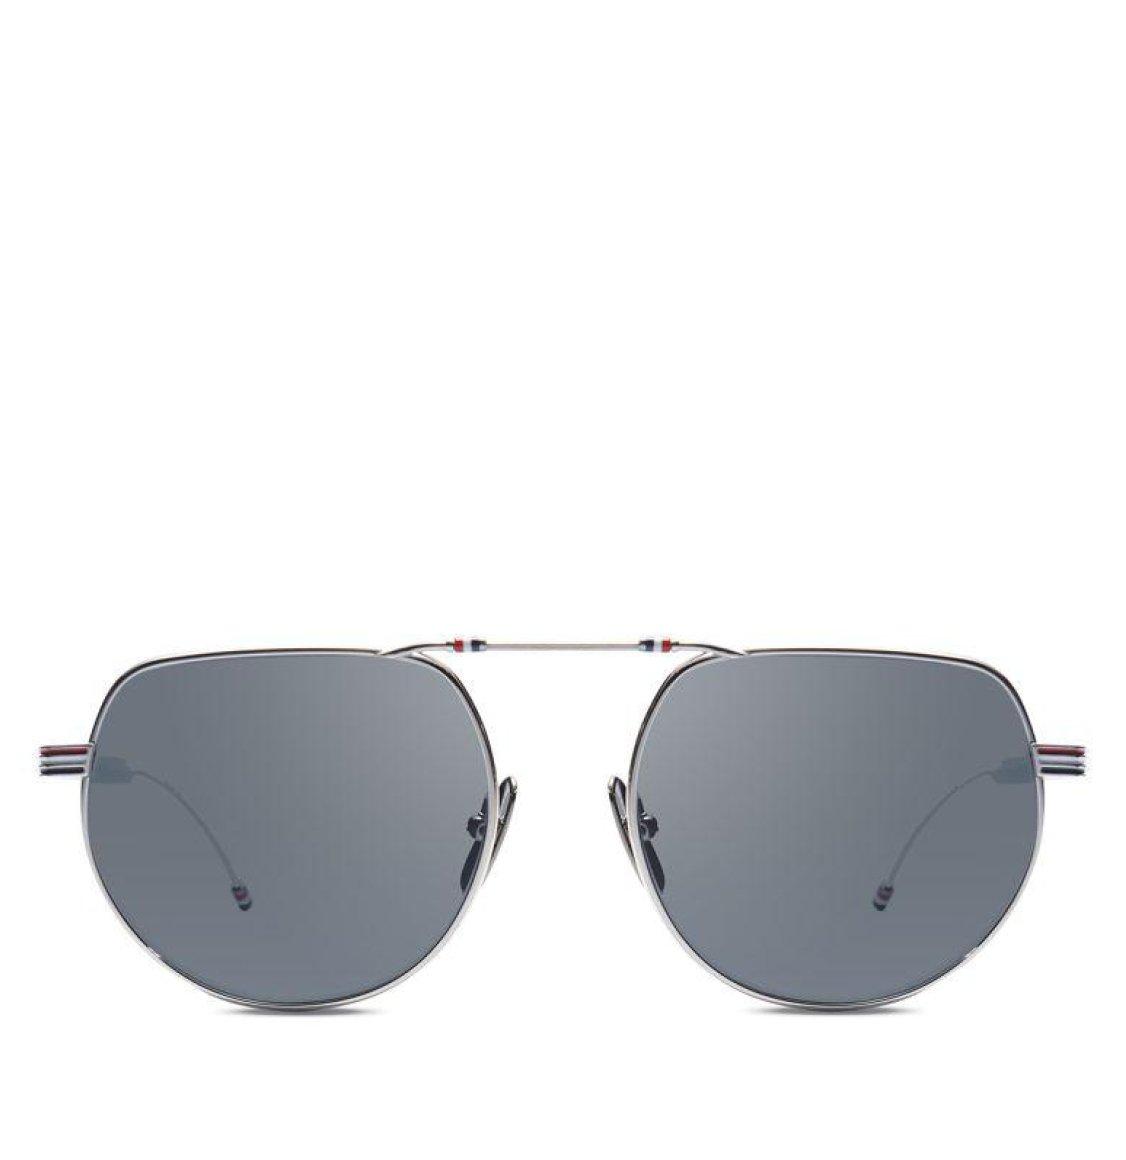 Thom Browne Silver Grey Square Aviator Sunglasses Γυαλιά Ηλίου